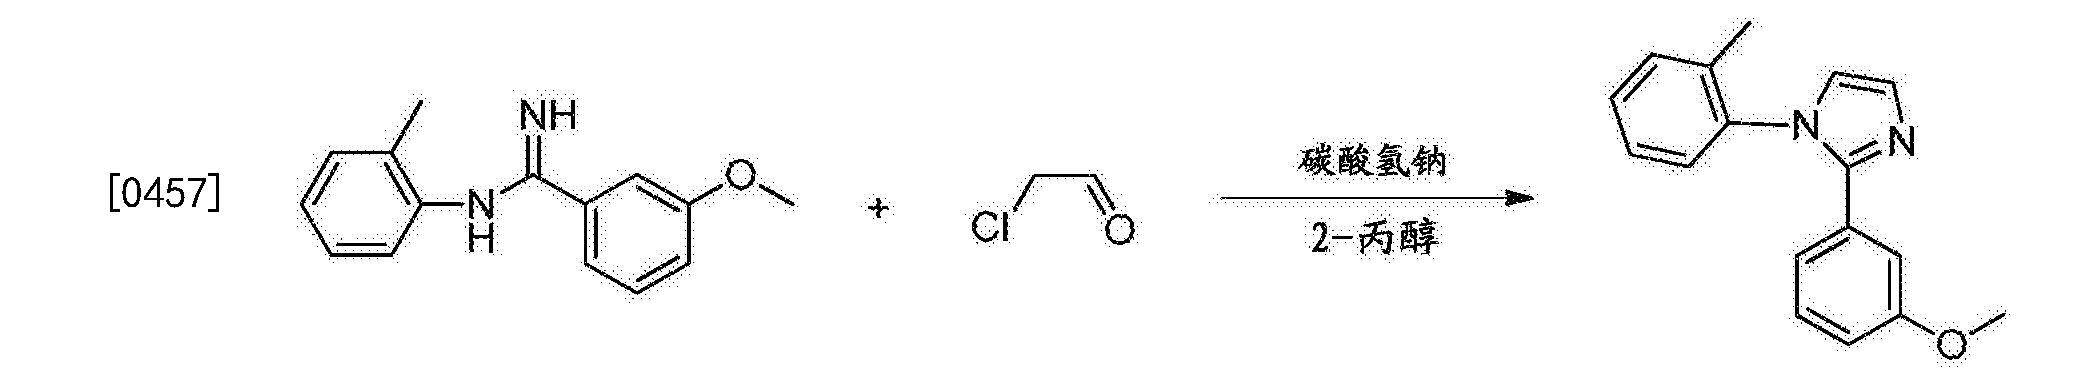 Figure CN106749425AD01451